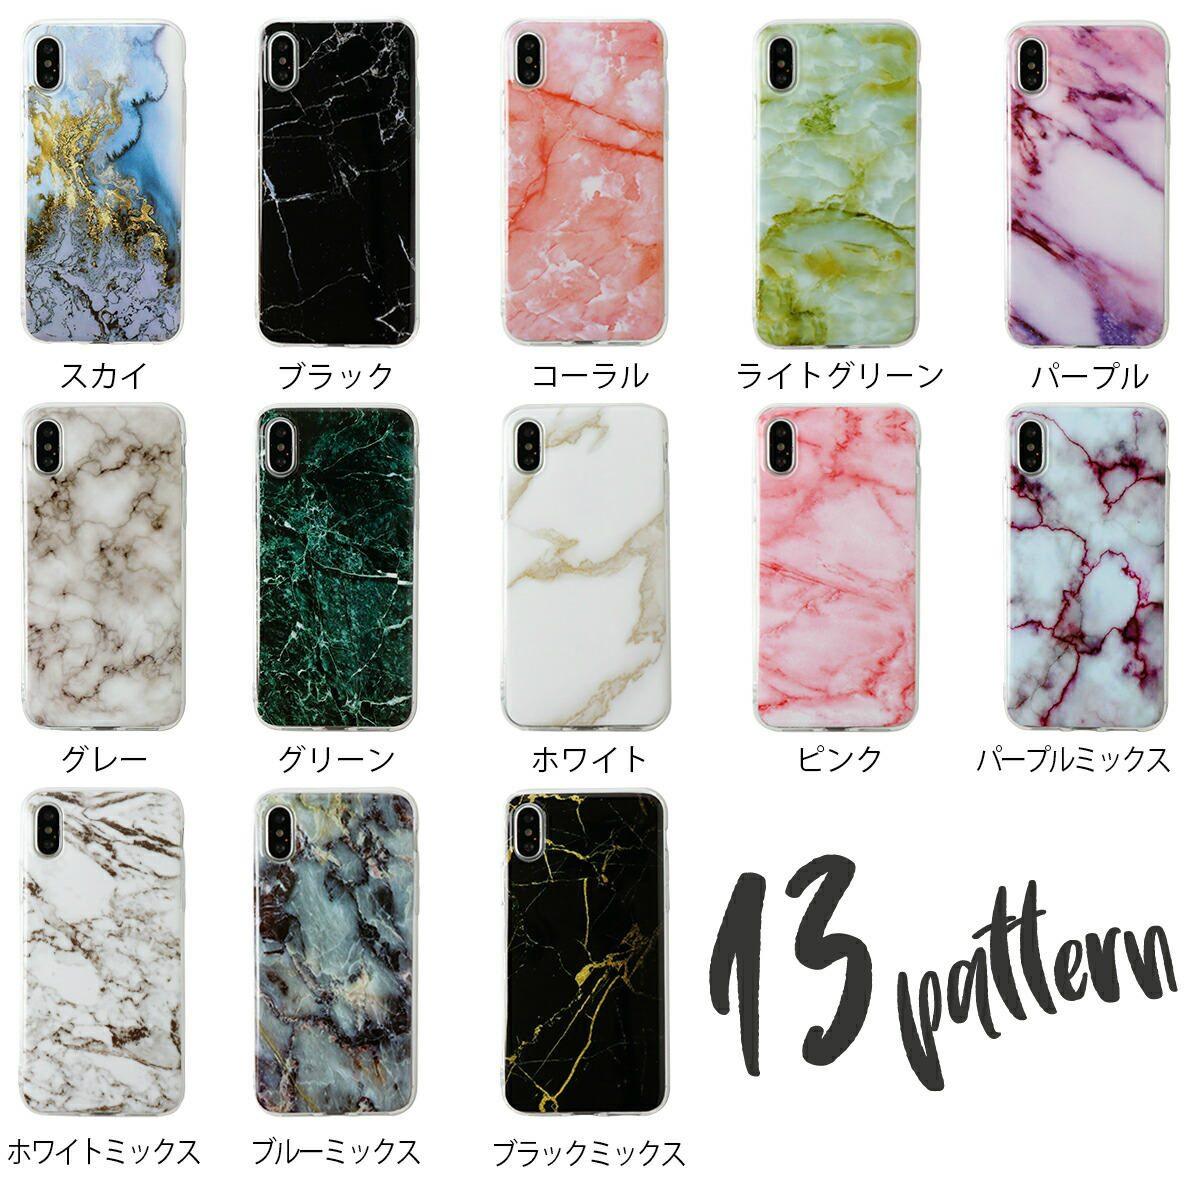 iPhone X/7/8/7Plus/8Plus/6/6s/5/5s/se/Galaxy Note8 SC-01K/SCV37/S8 SC-02J/SCV36/S8+ SC-03J/SCV35/S7 edge SC-02H/SCV33/Huawei P10Lite/P9Lite 大理石調TPUケース